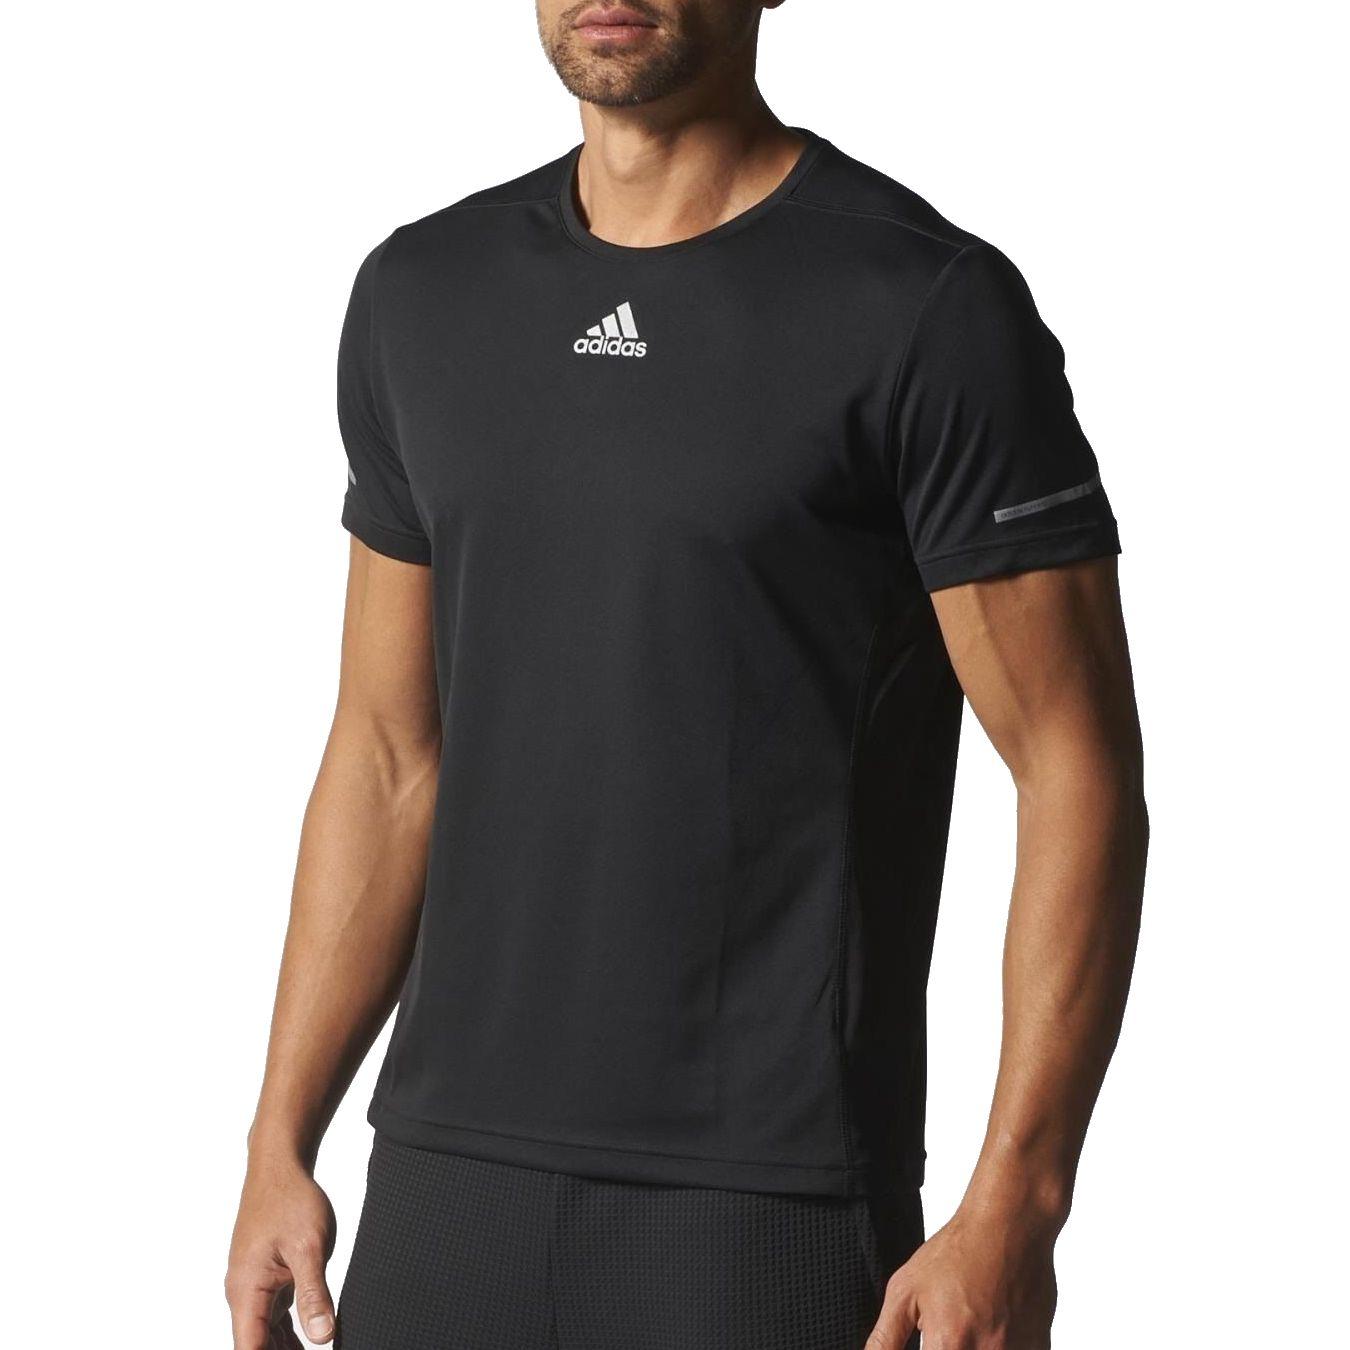 adidas laufshirt kurzarm langarm running fitnessshirt. Black Bedroom Furniture Sets. Home Design Ideas